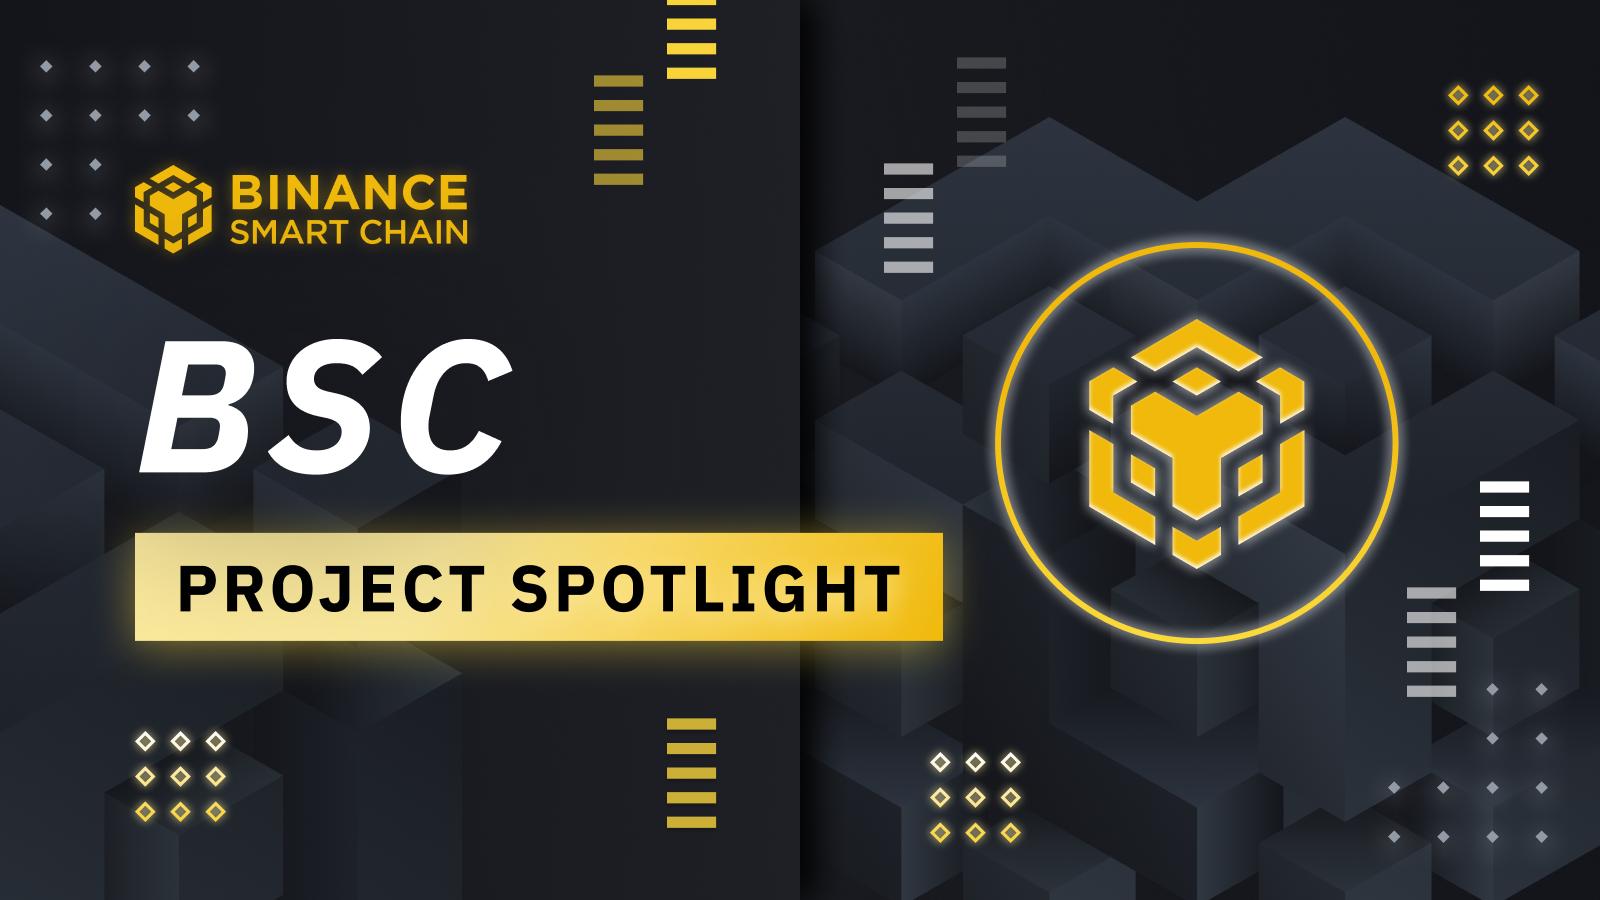 BSC Project Spotlight: Tranchess